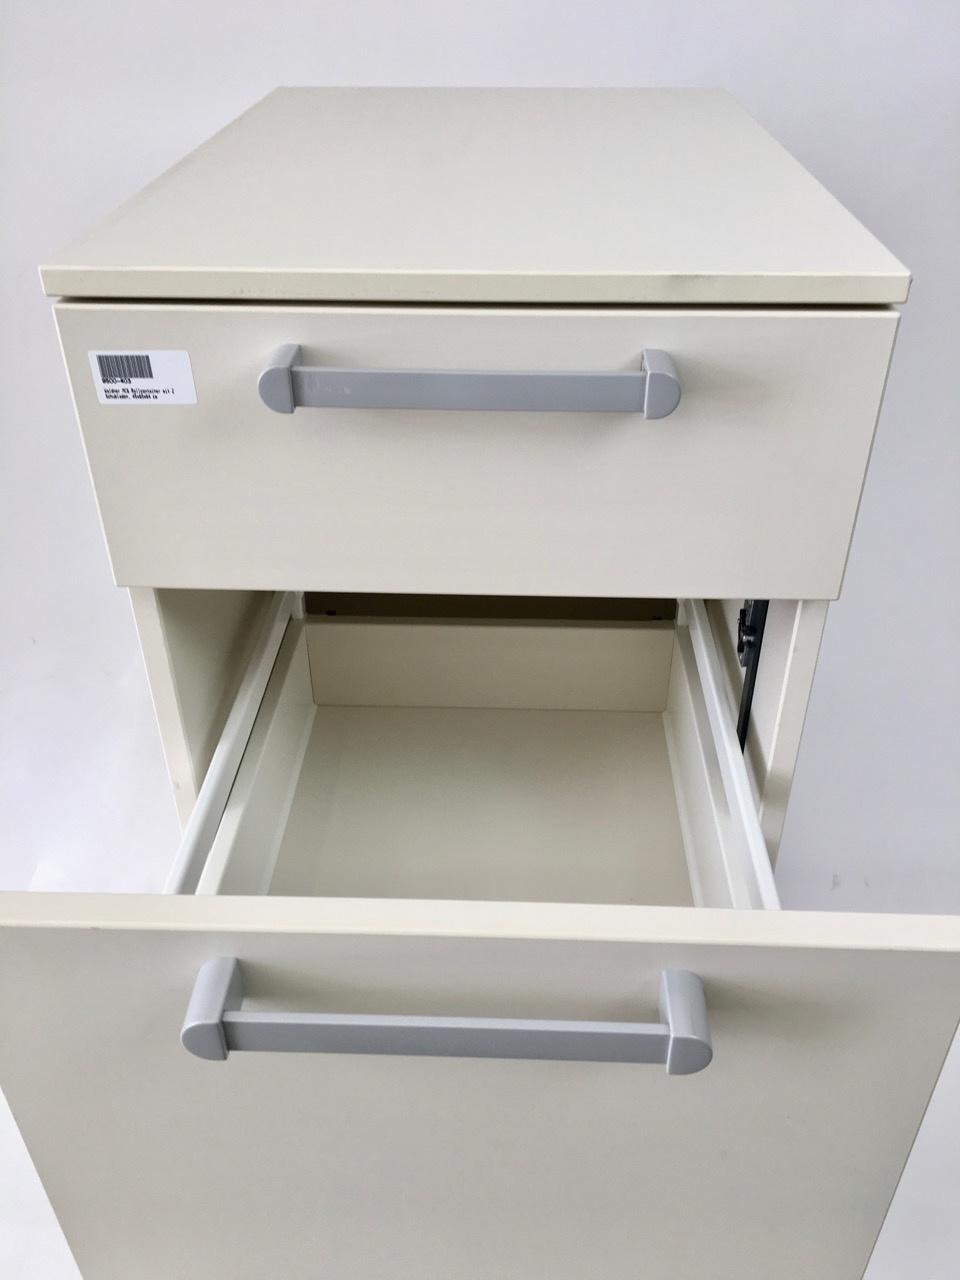 Waldner Waldner MC6 mobile cabinet, 2 drawers, 45 cm width, 64cm height